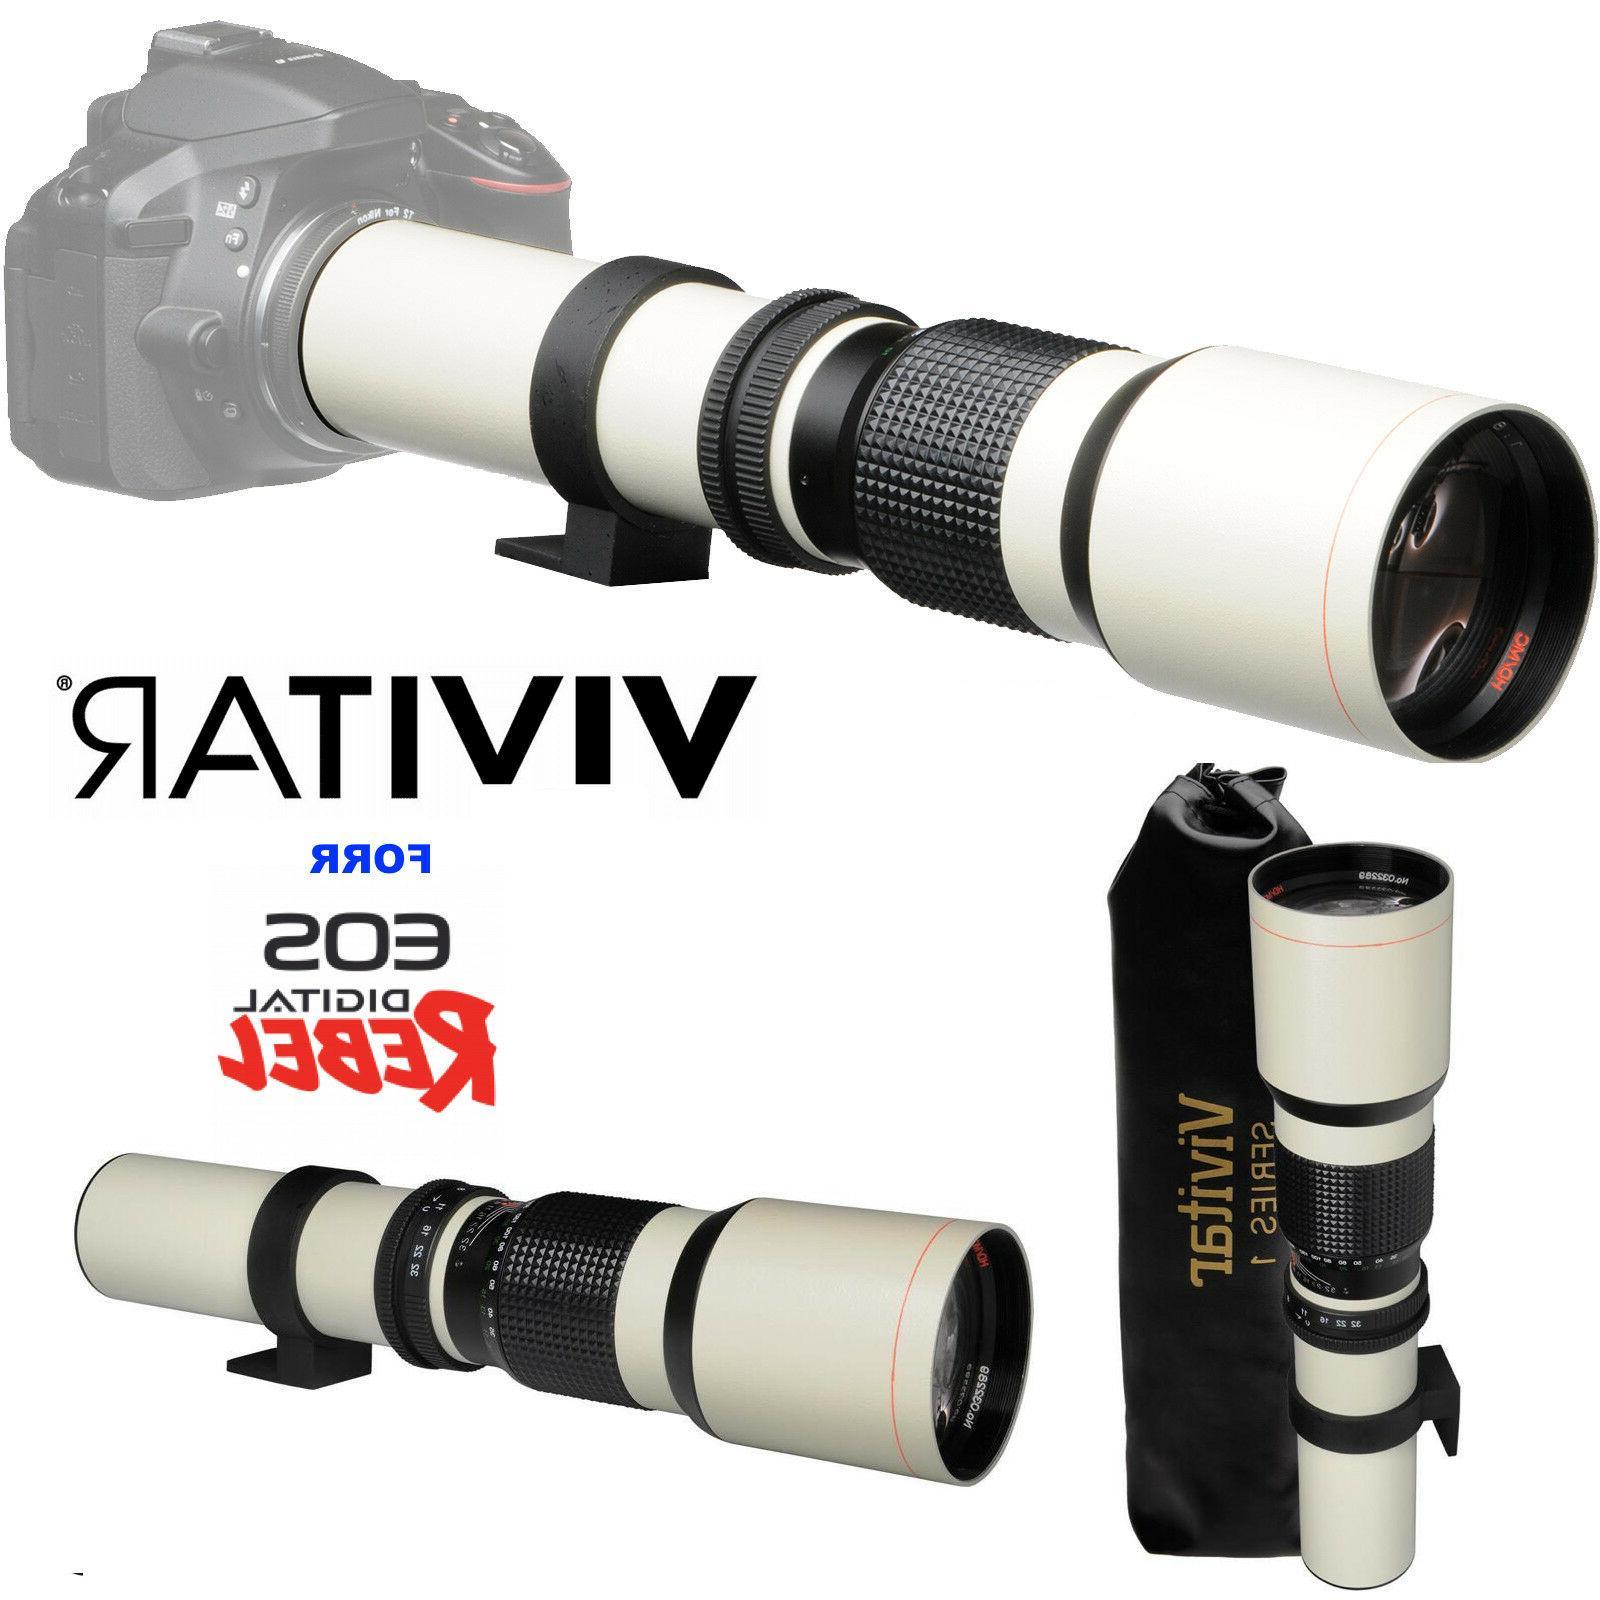 VIVITAR WHITE TELEPHOTO TELESCOPIC FOR DSLR